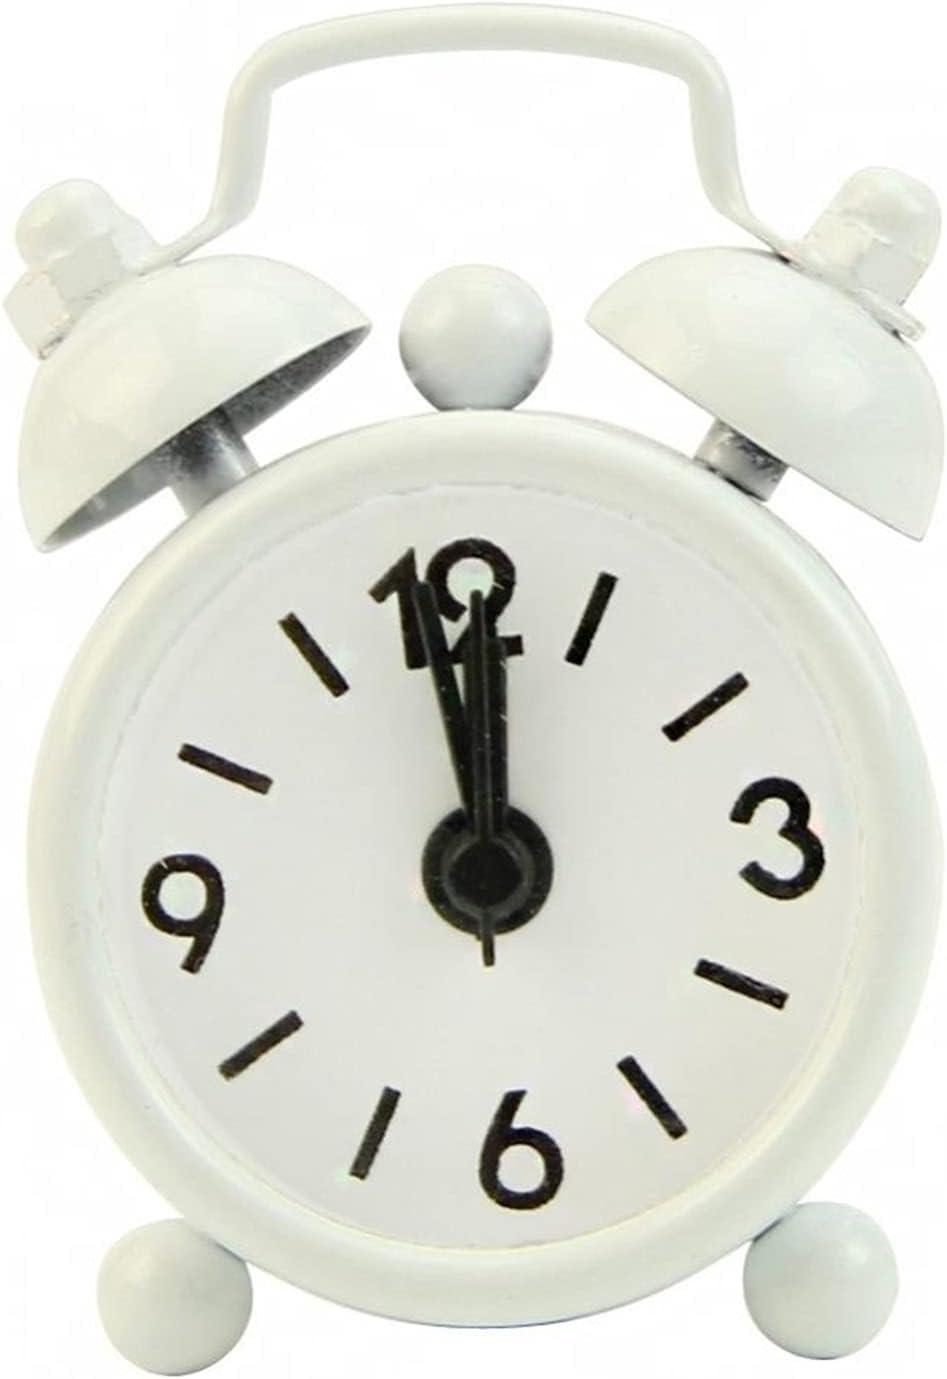 In stock Fuxwlgs Alarm Clock Student Mini Classic National uniform free shipping Home Cute B